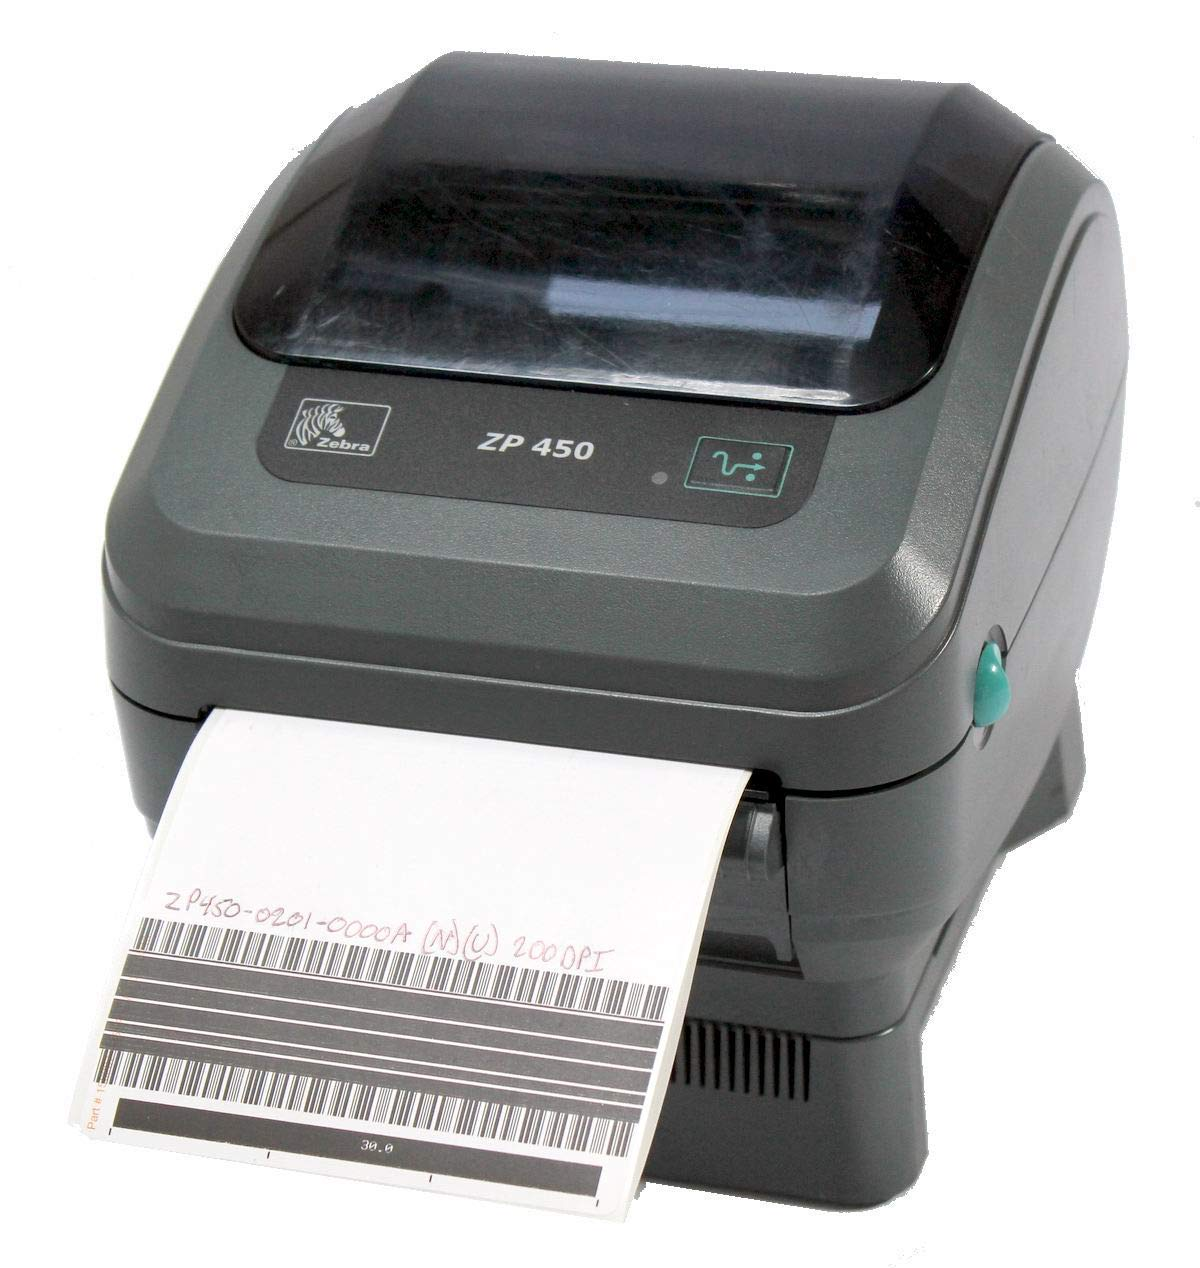 Zebra ZP 450 ZP450-0201-0000A Direct Thermal Barcode Label Printer Network USB Peeler 203dpi (Renewed)